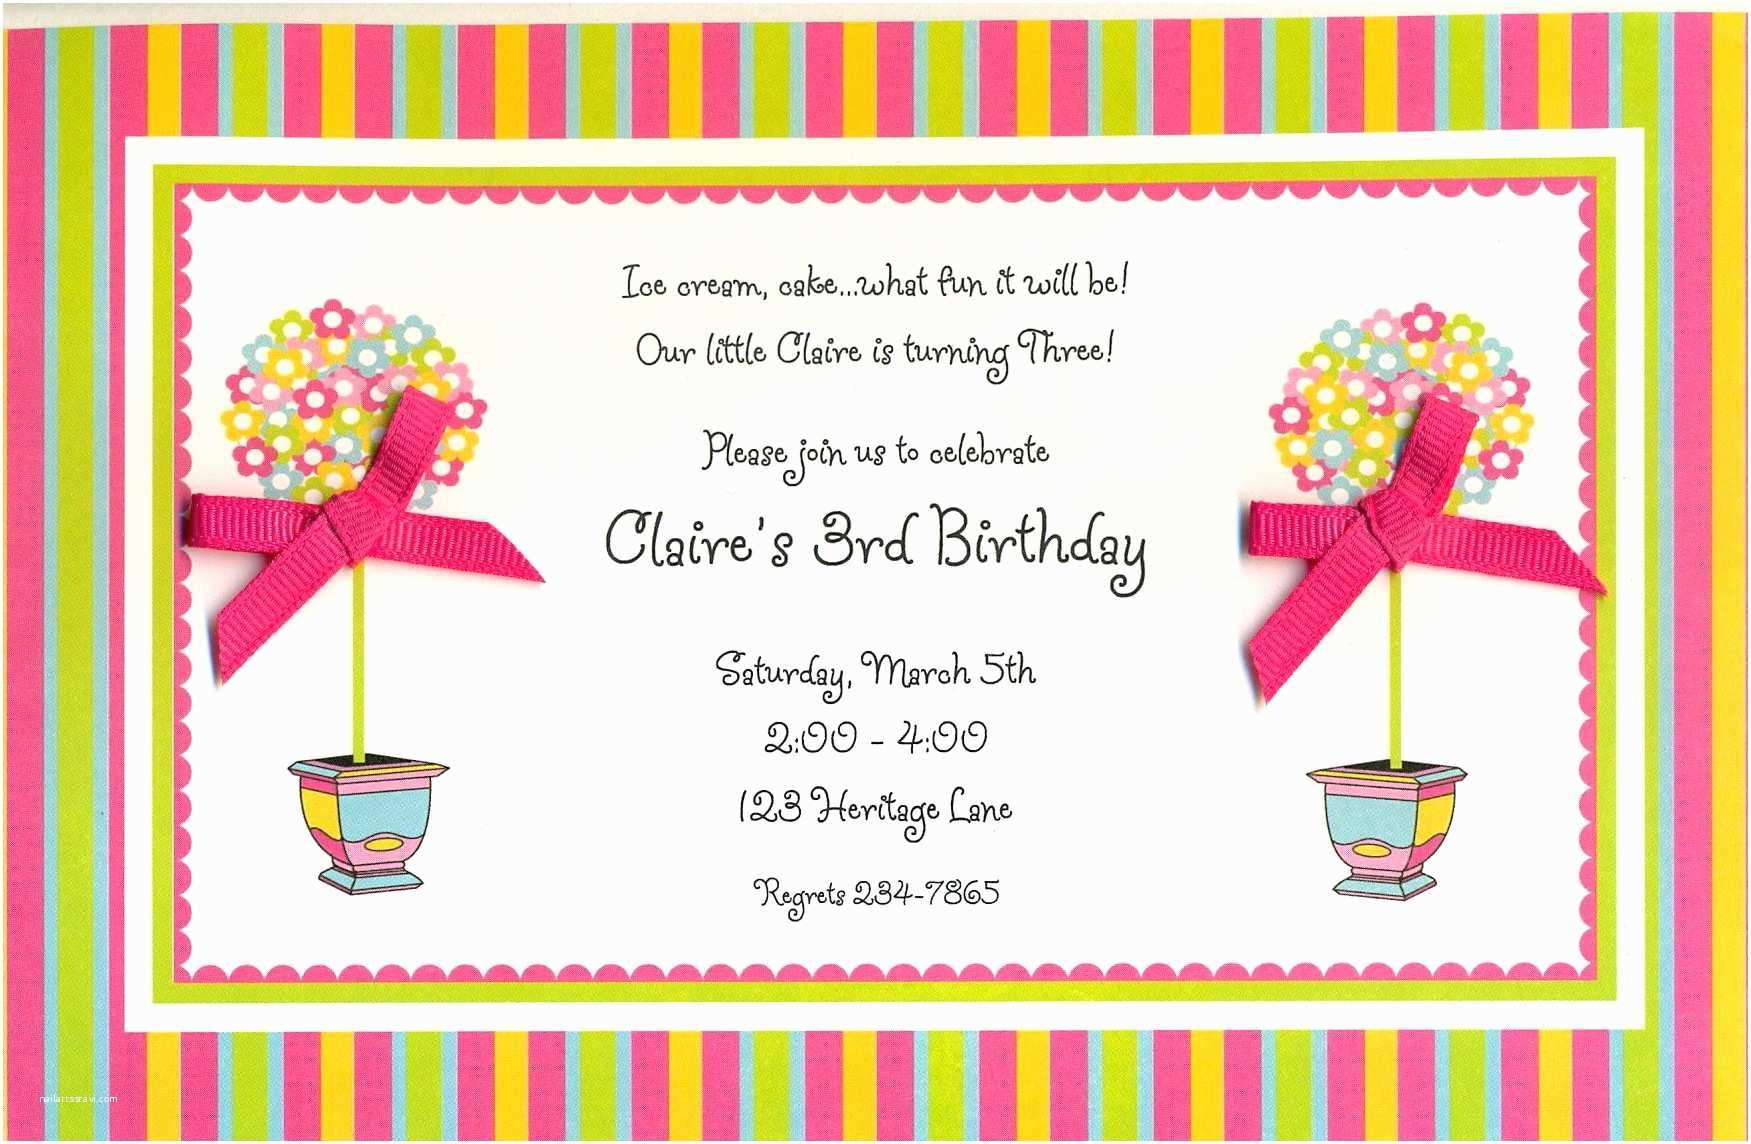 Birthday Invitation Message Dinner Party Wording